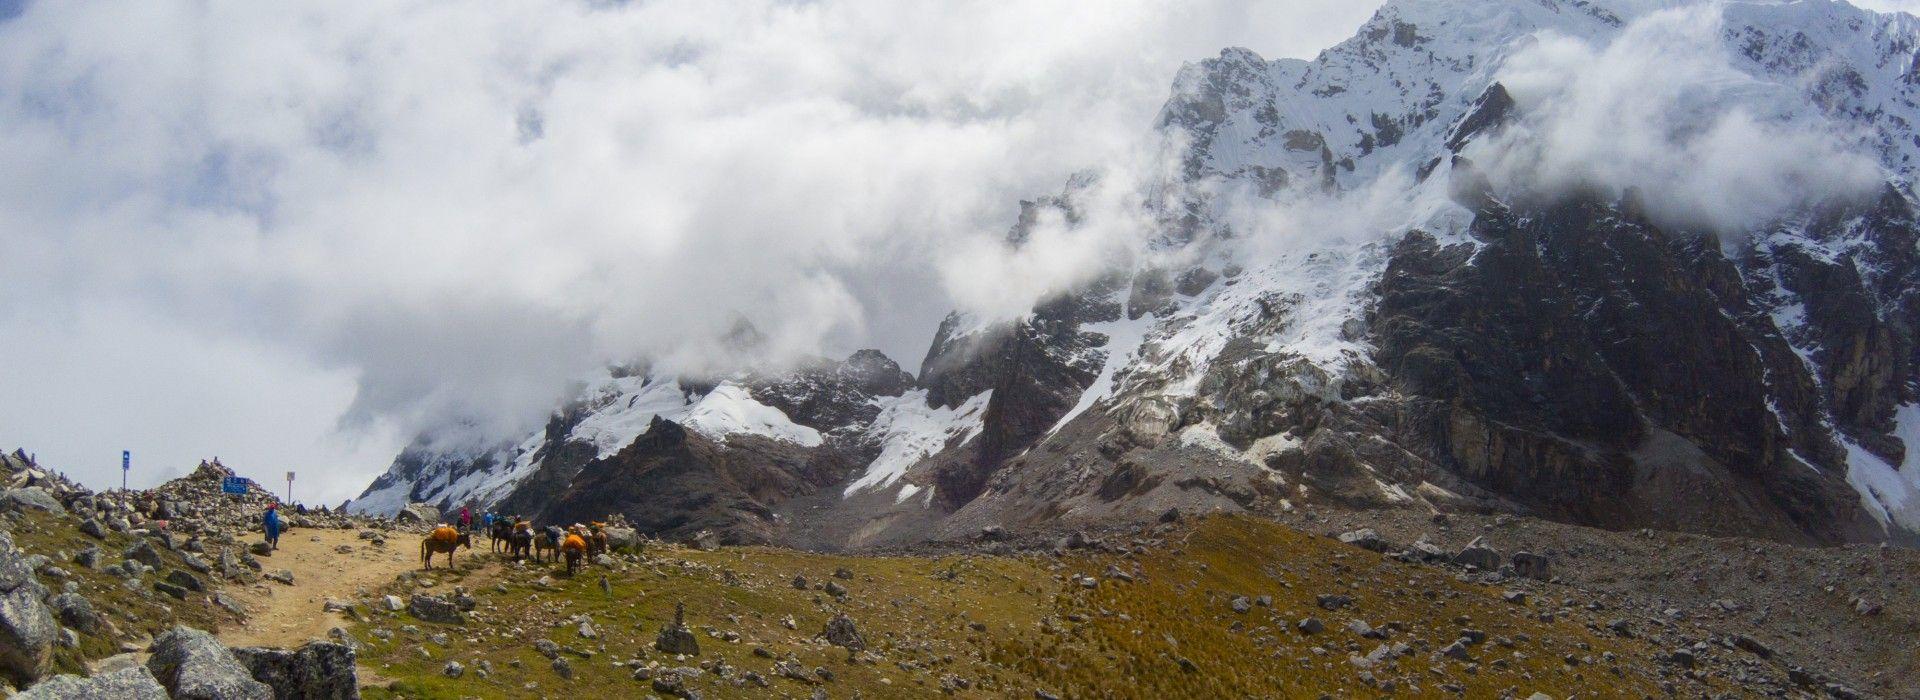 Trekking Tours in Machu Picchu